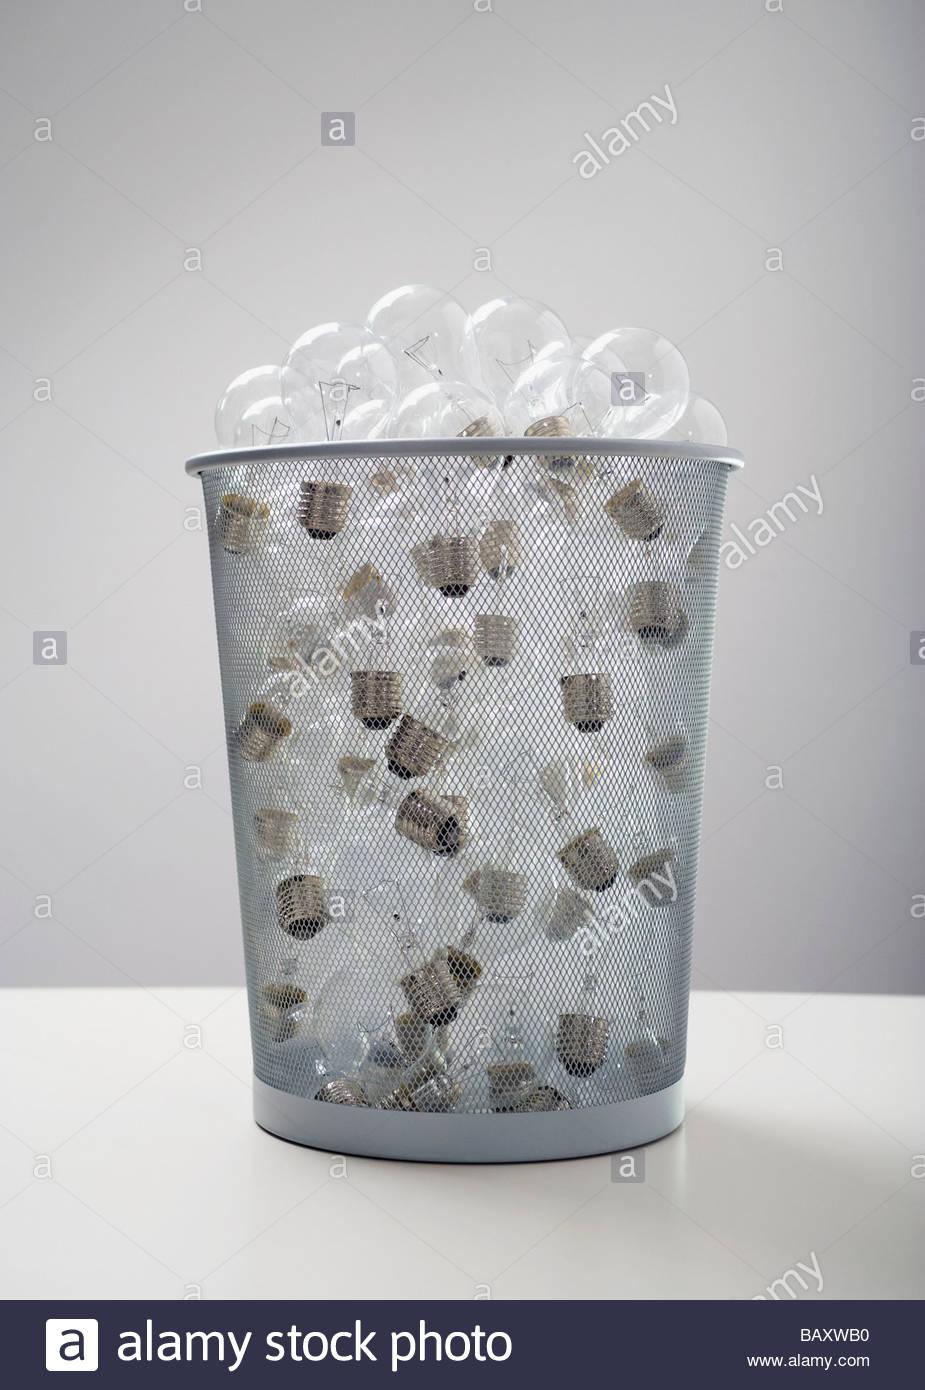 Wastebasket full of old-fashioned light bulbs Stock Photo